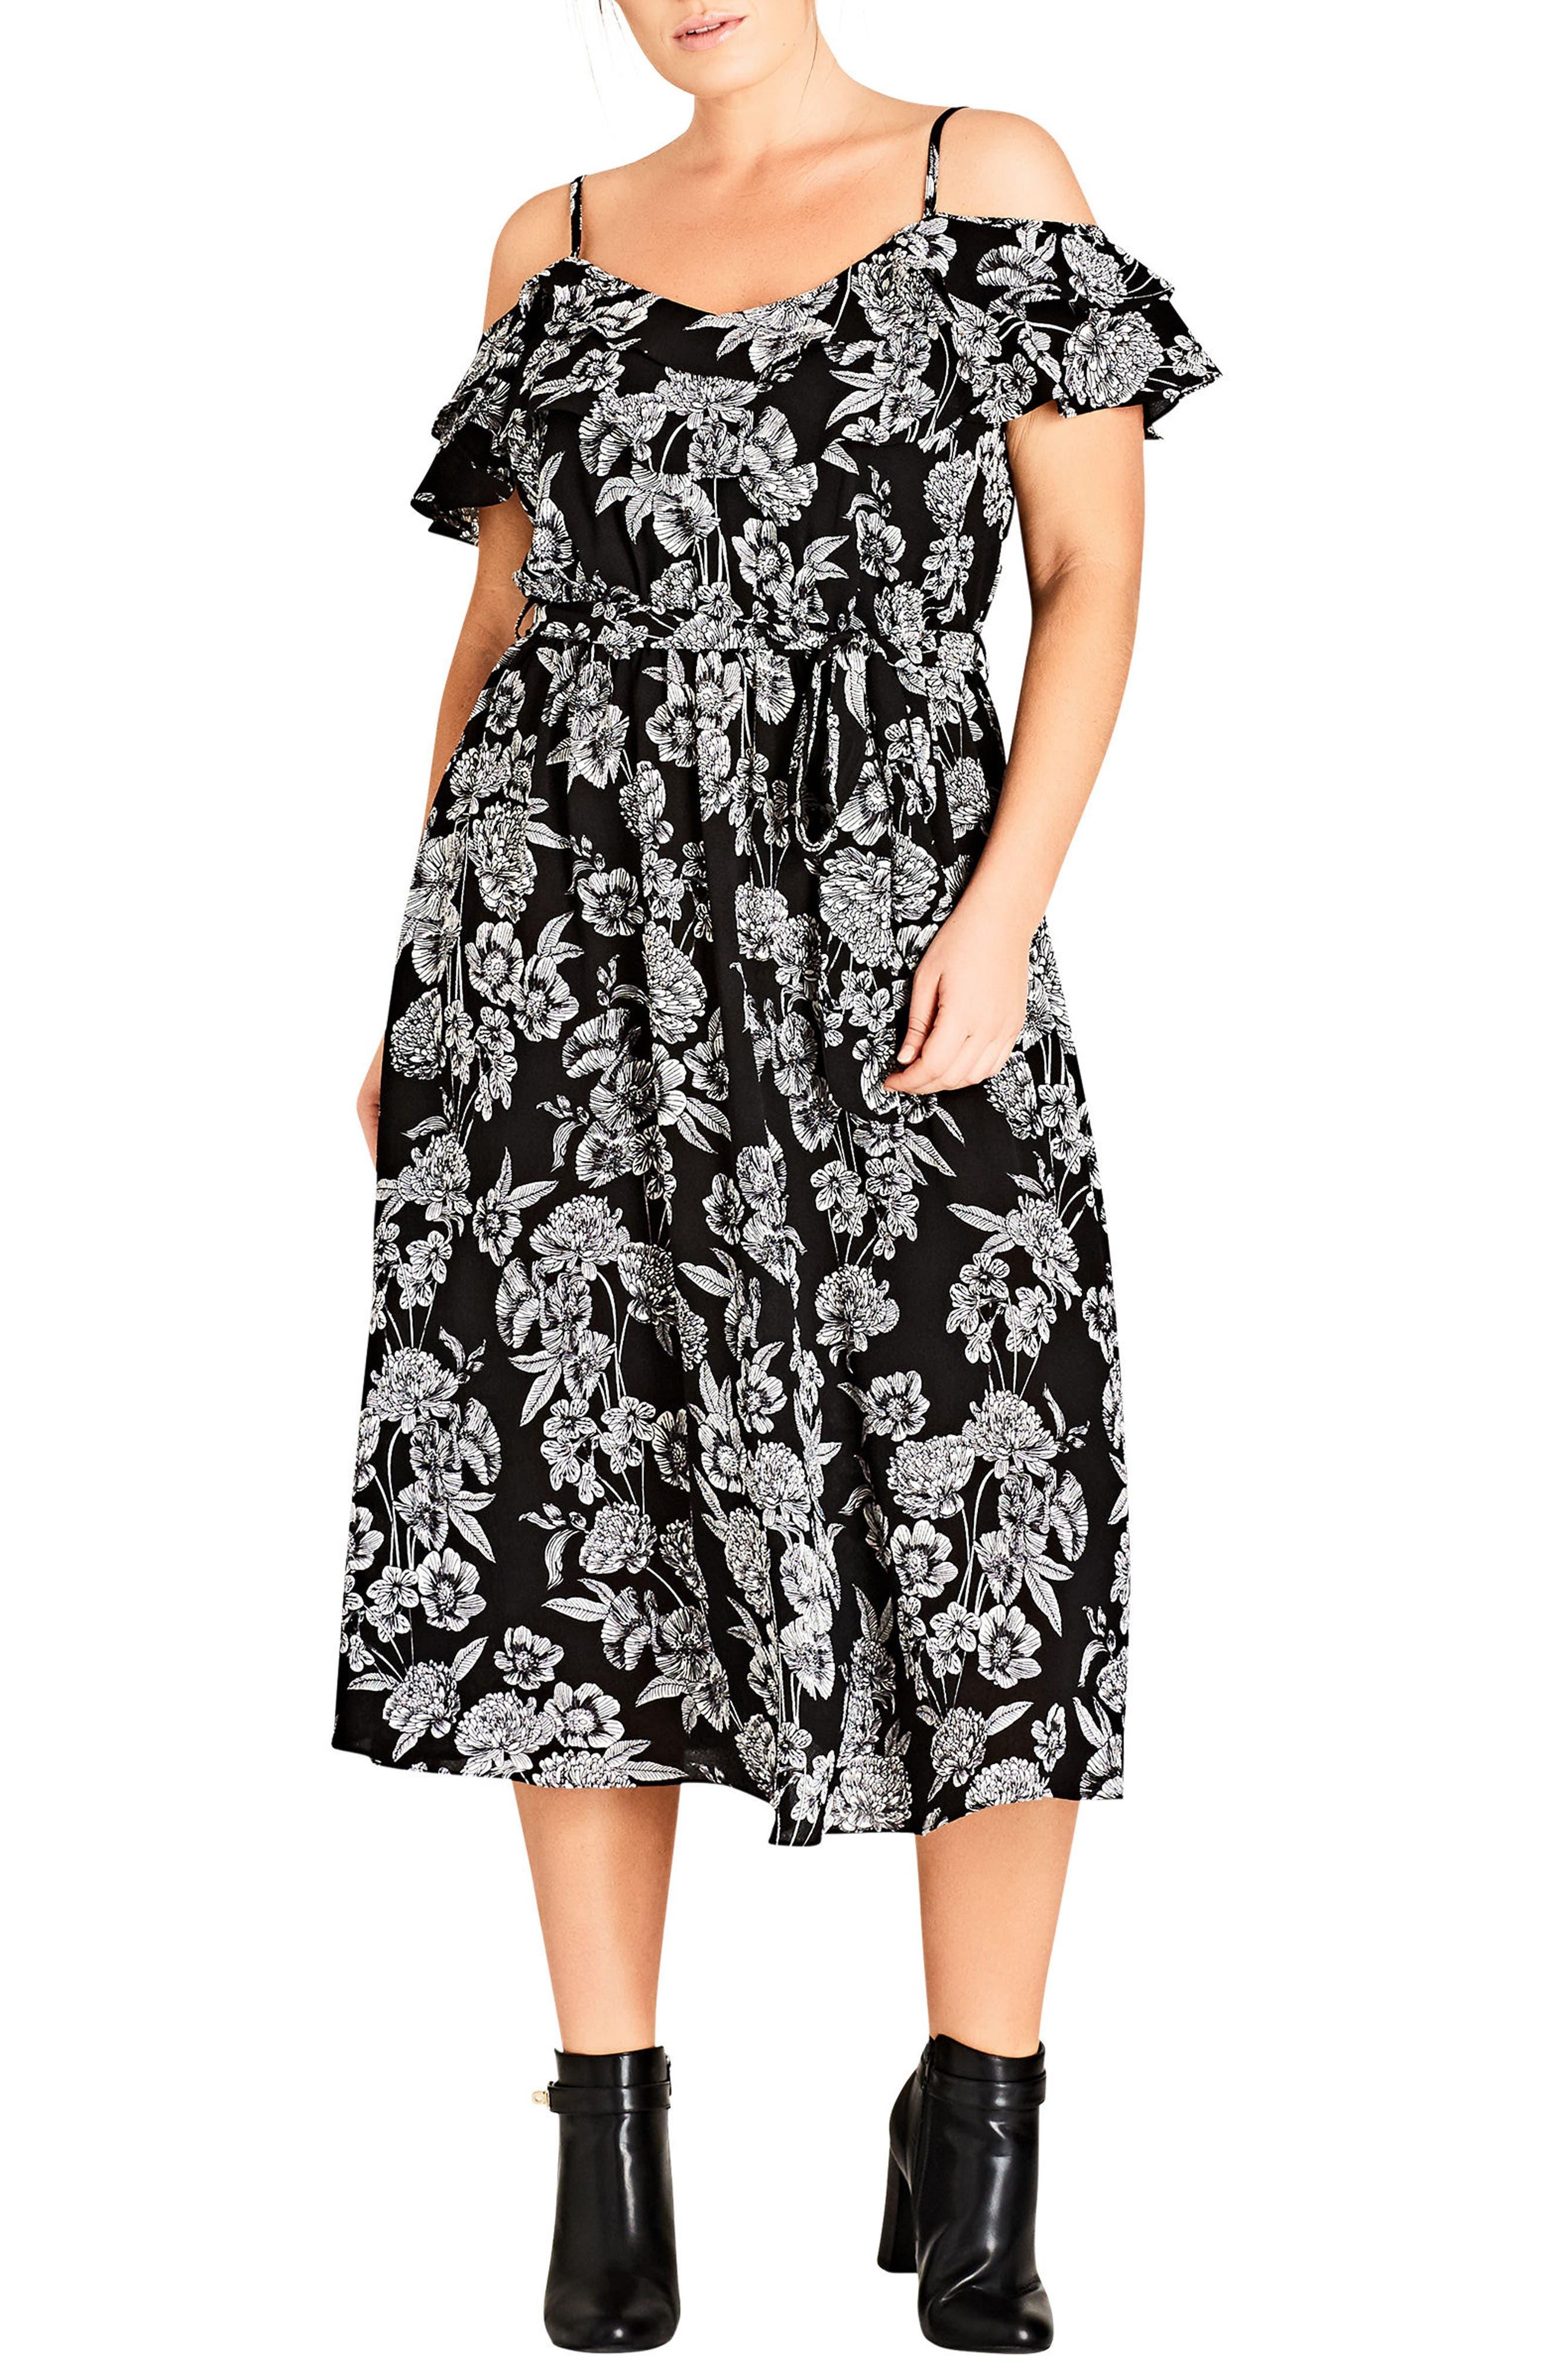 Bloomsbury Midi Dress,                             Main thumbnail 1, color,